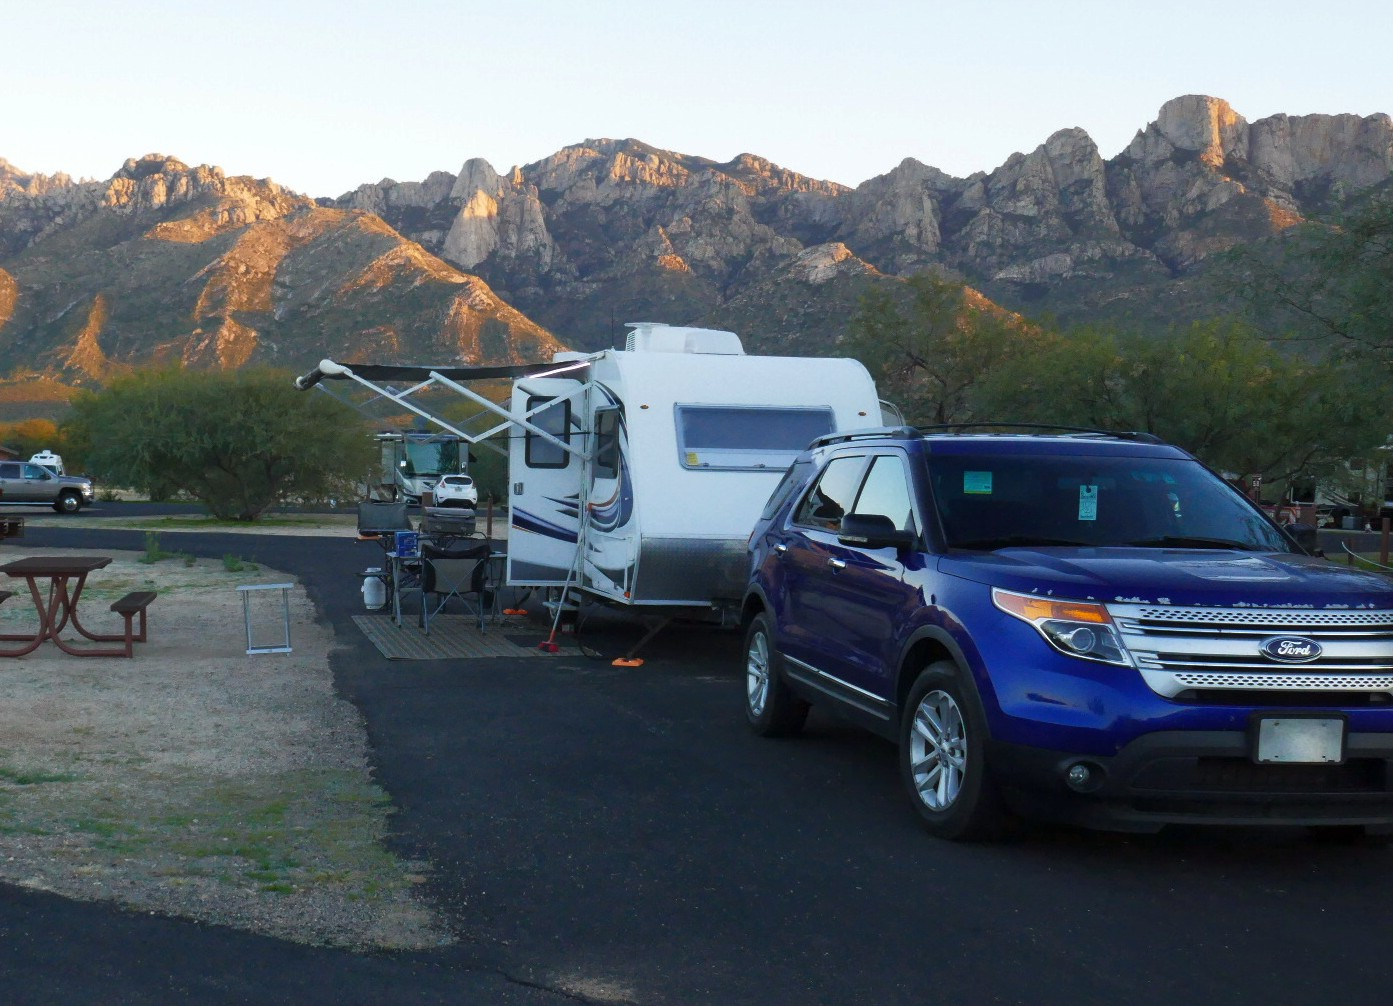 Notre campement aun Catalina SP Tucson AZ